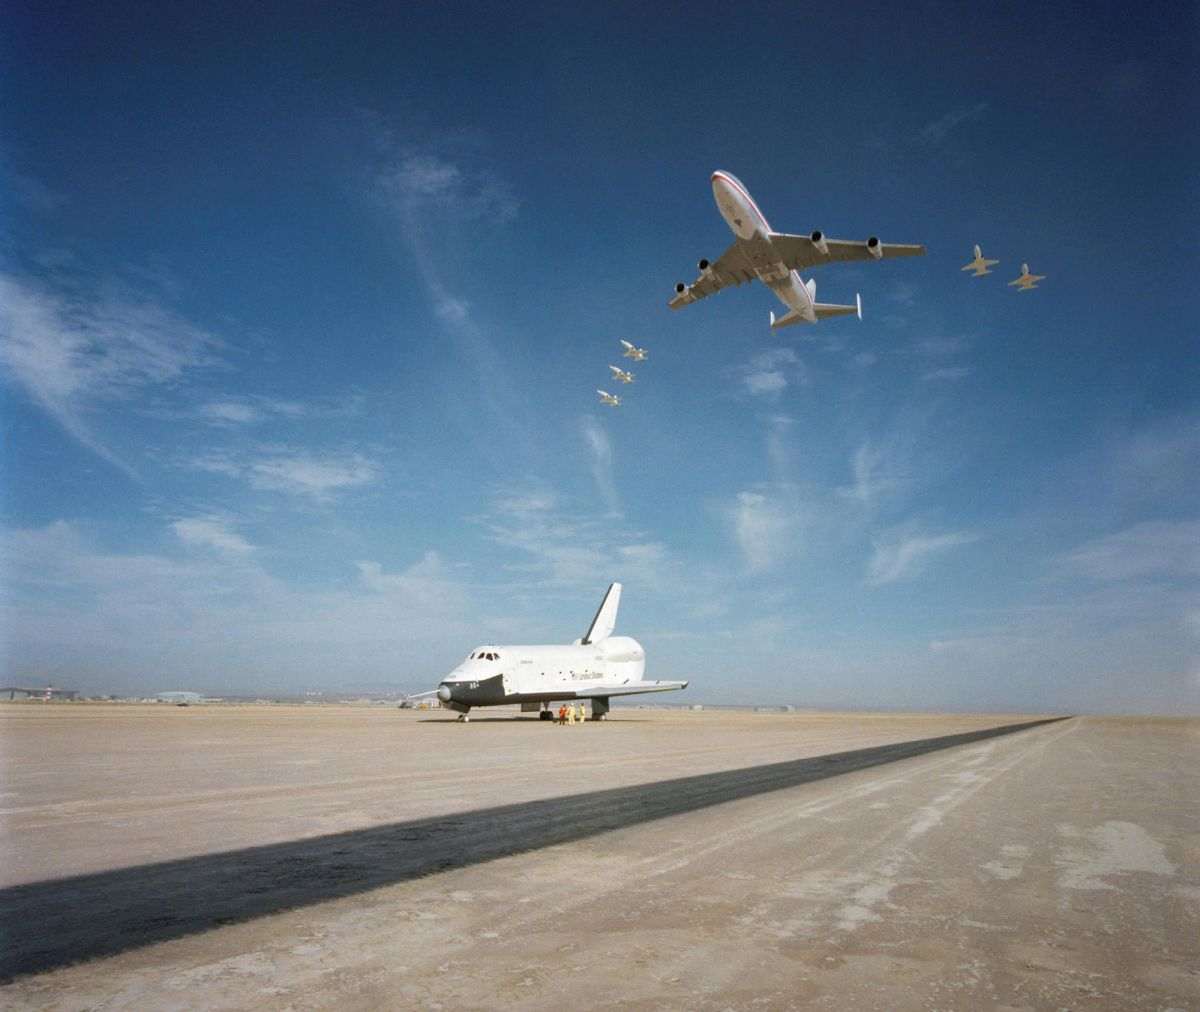 Photos: NASA's Amazing T-38 Supersonic Jet Planes | Space